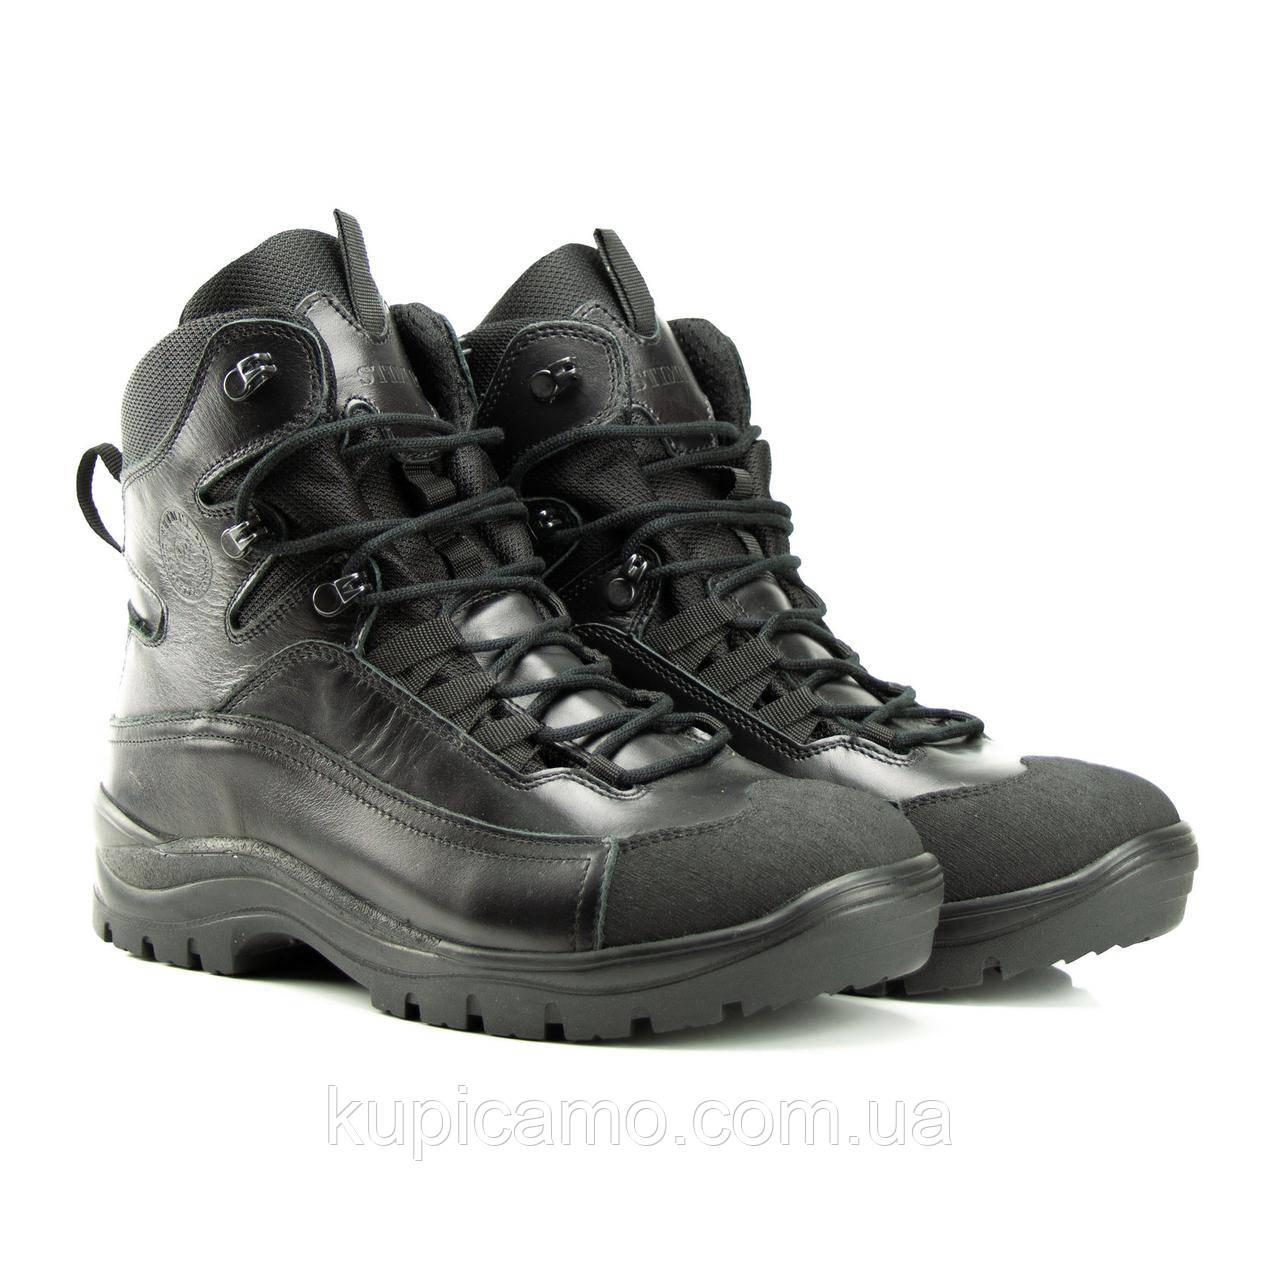 Ботинки Атаман зима (черный глянец)